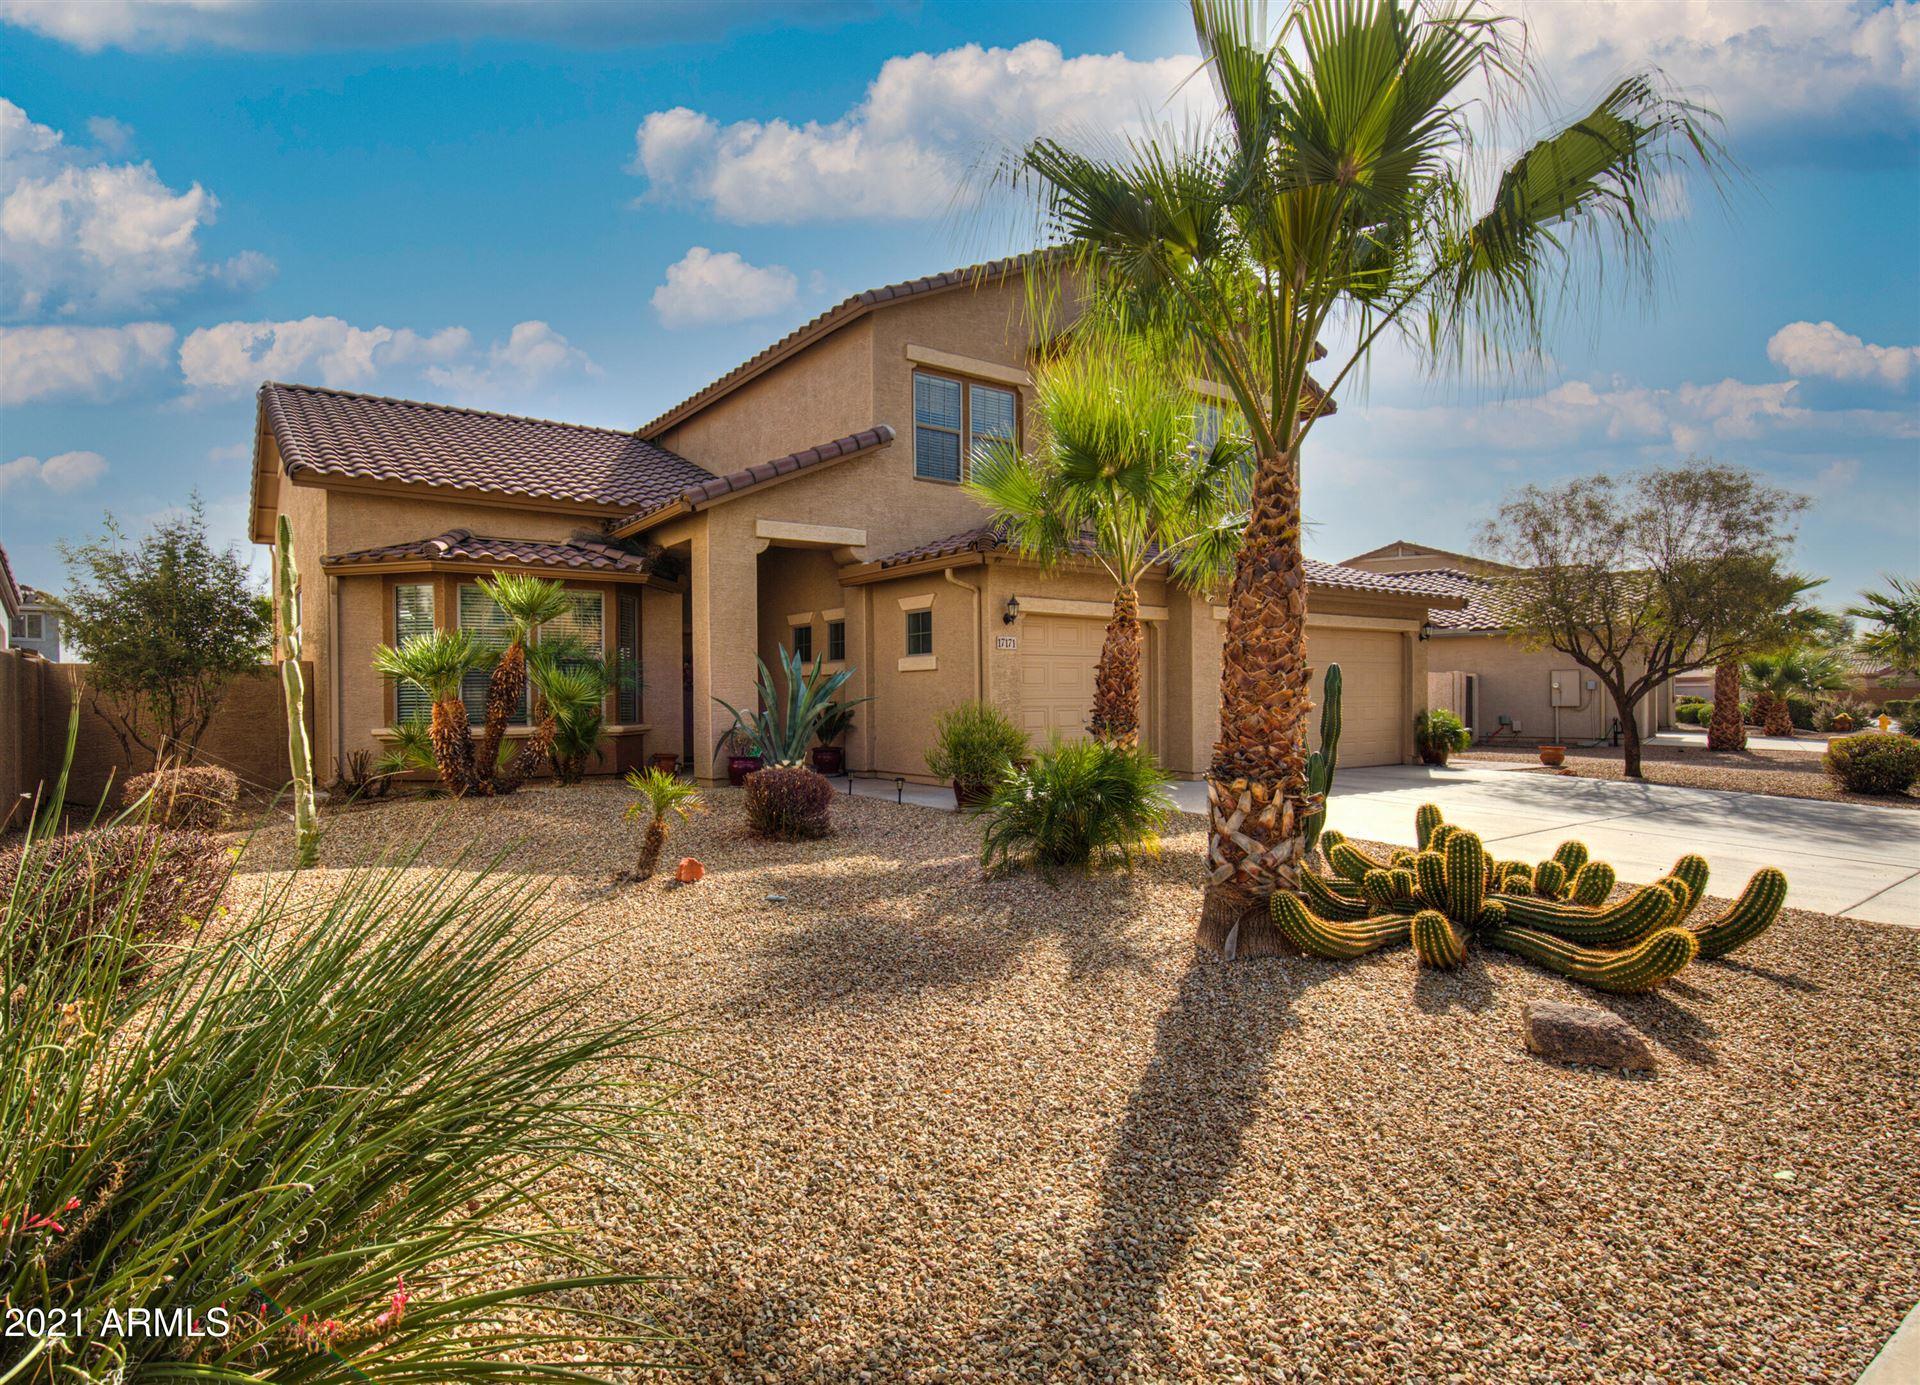 Photo of 17171 N OLIVETO Avenue, Maricopa, AZ 85138 (MLS # 6307621)